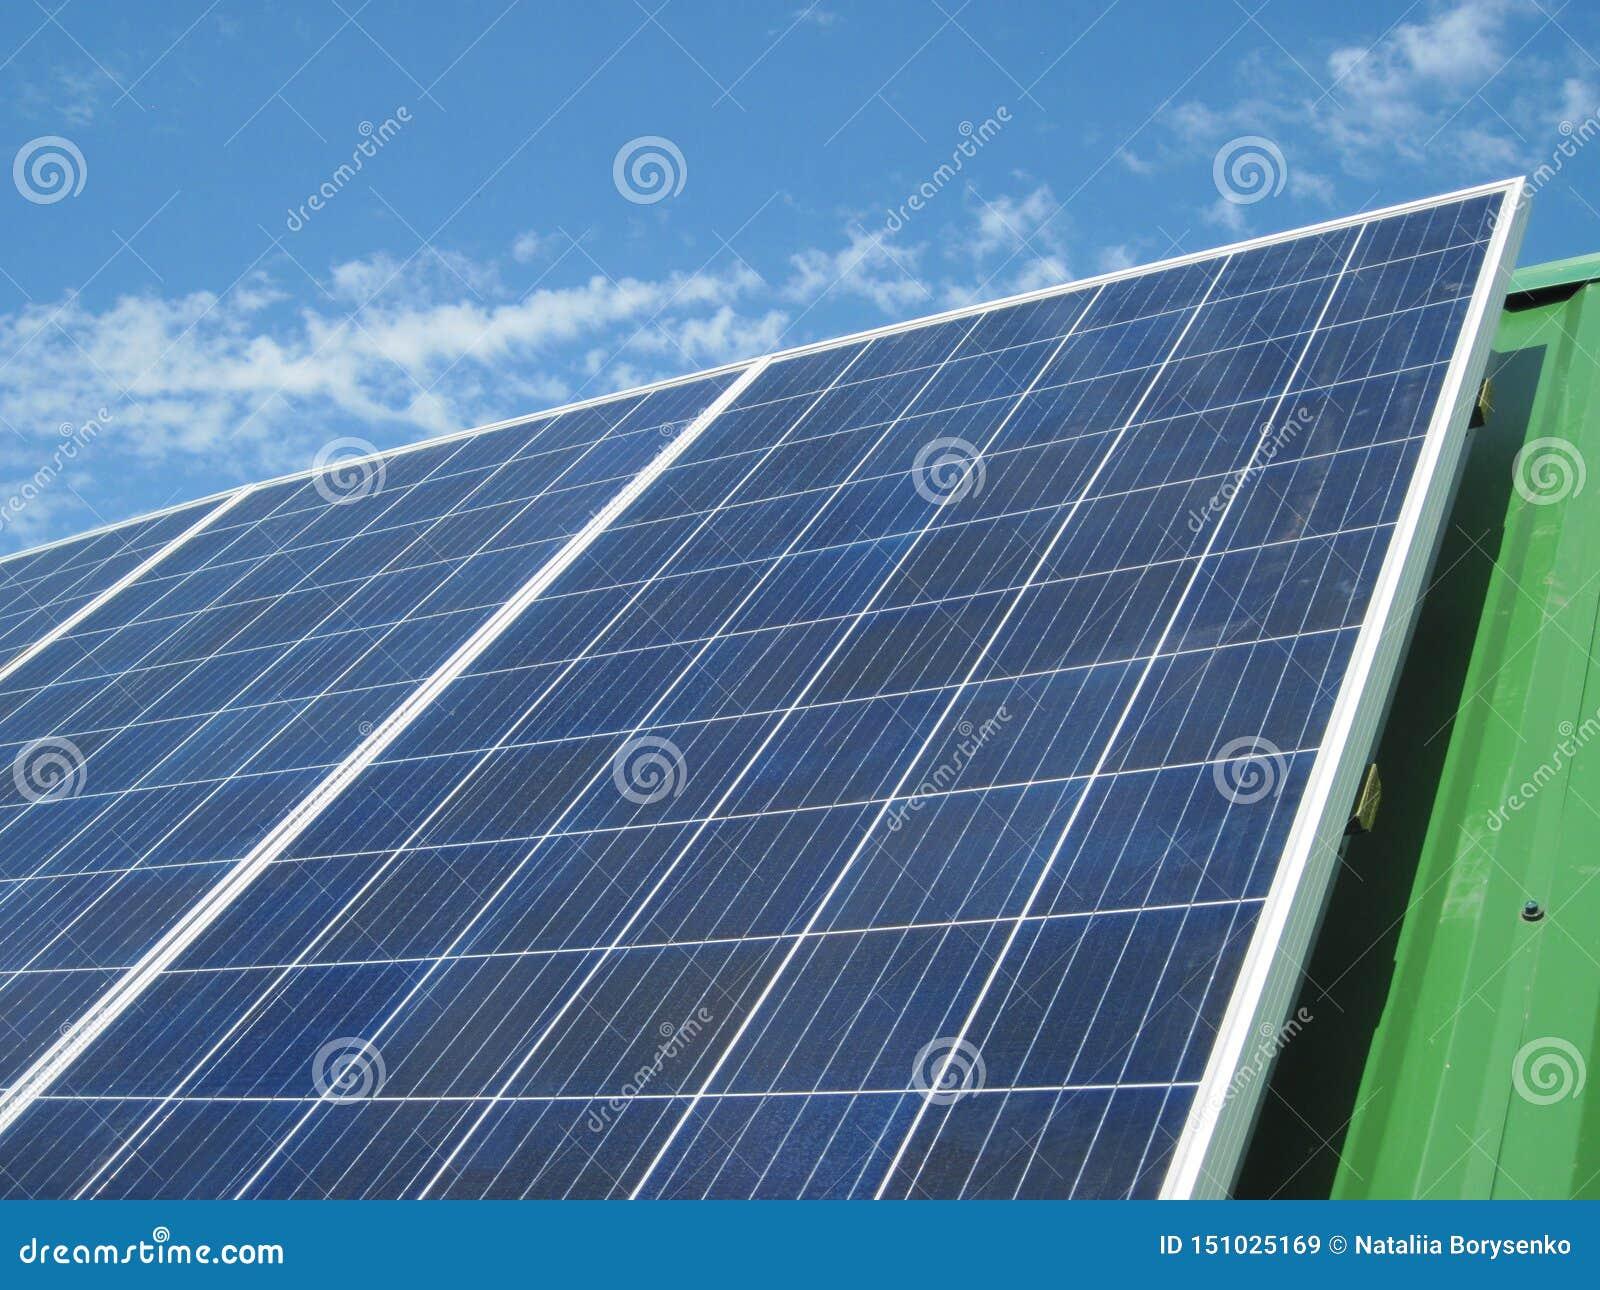 Renewable Energy - Photovoltaic Cells - Solar Panels For